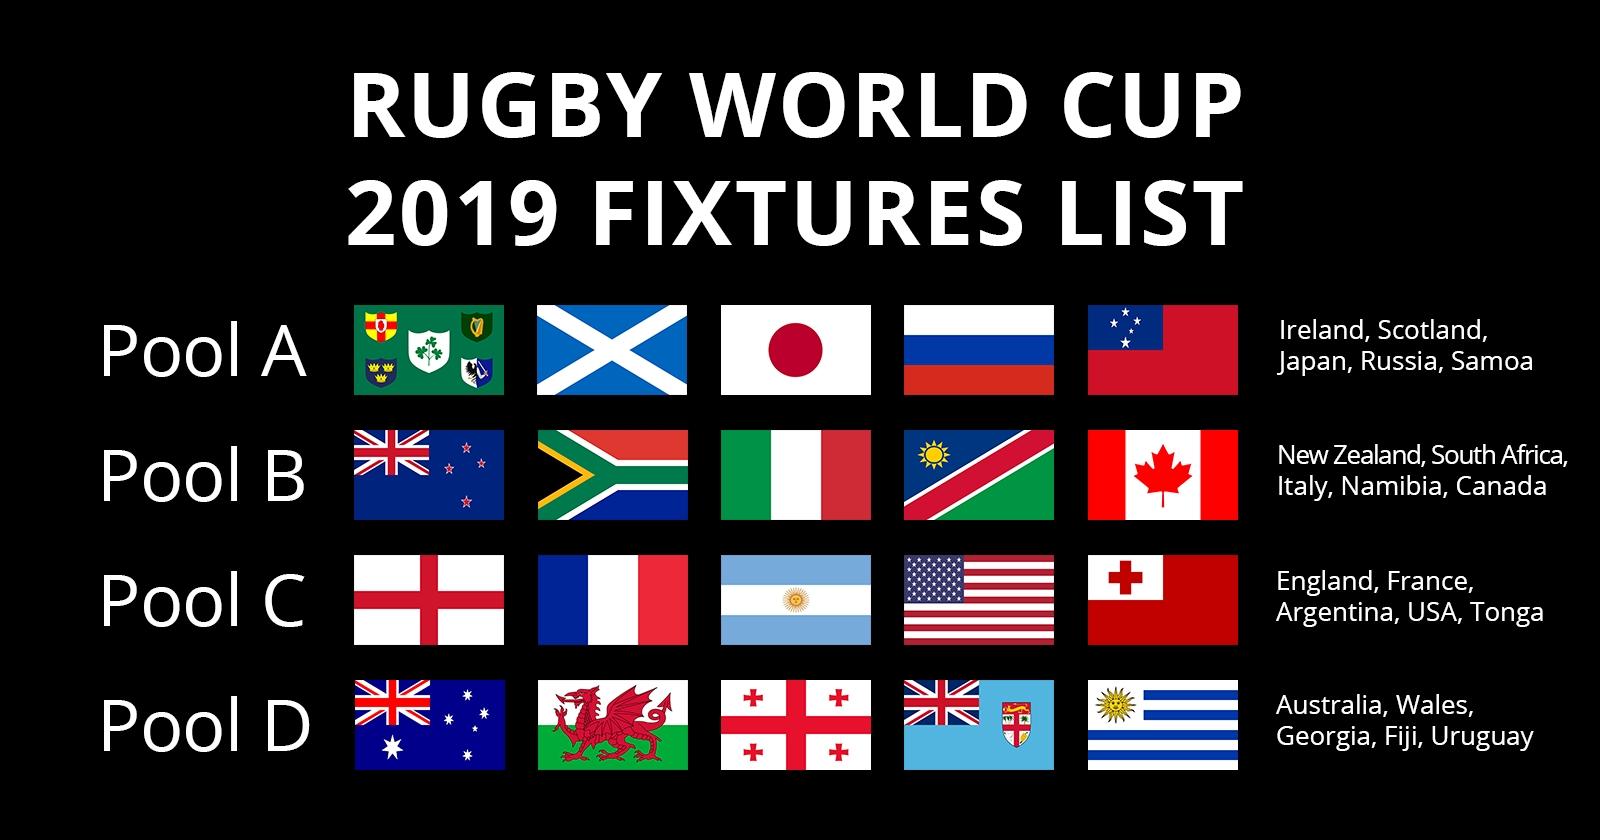 Rugby World Cup 2019 Fixtures | Autumn Internationals 6 Nations Calendar 2019